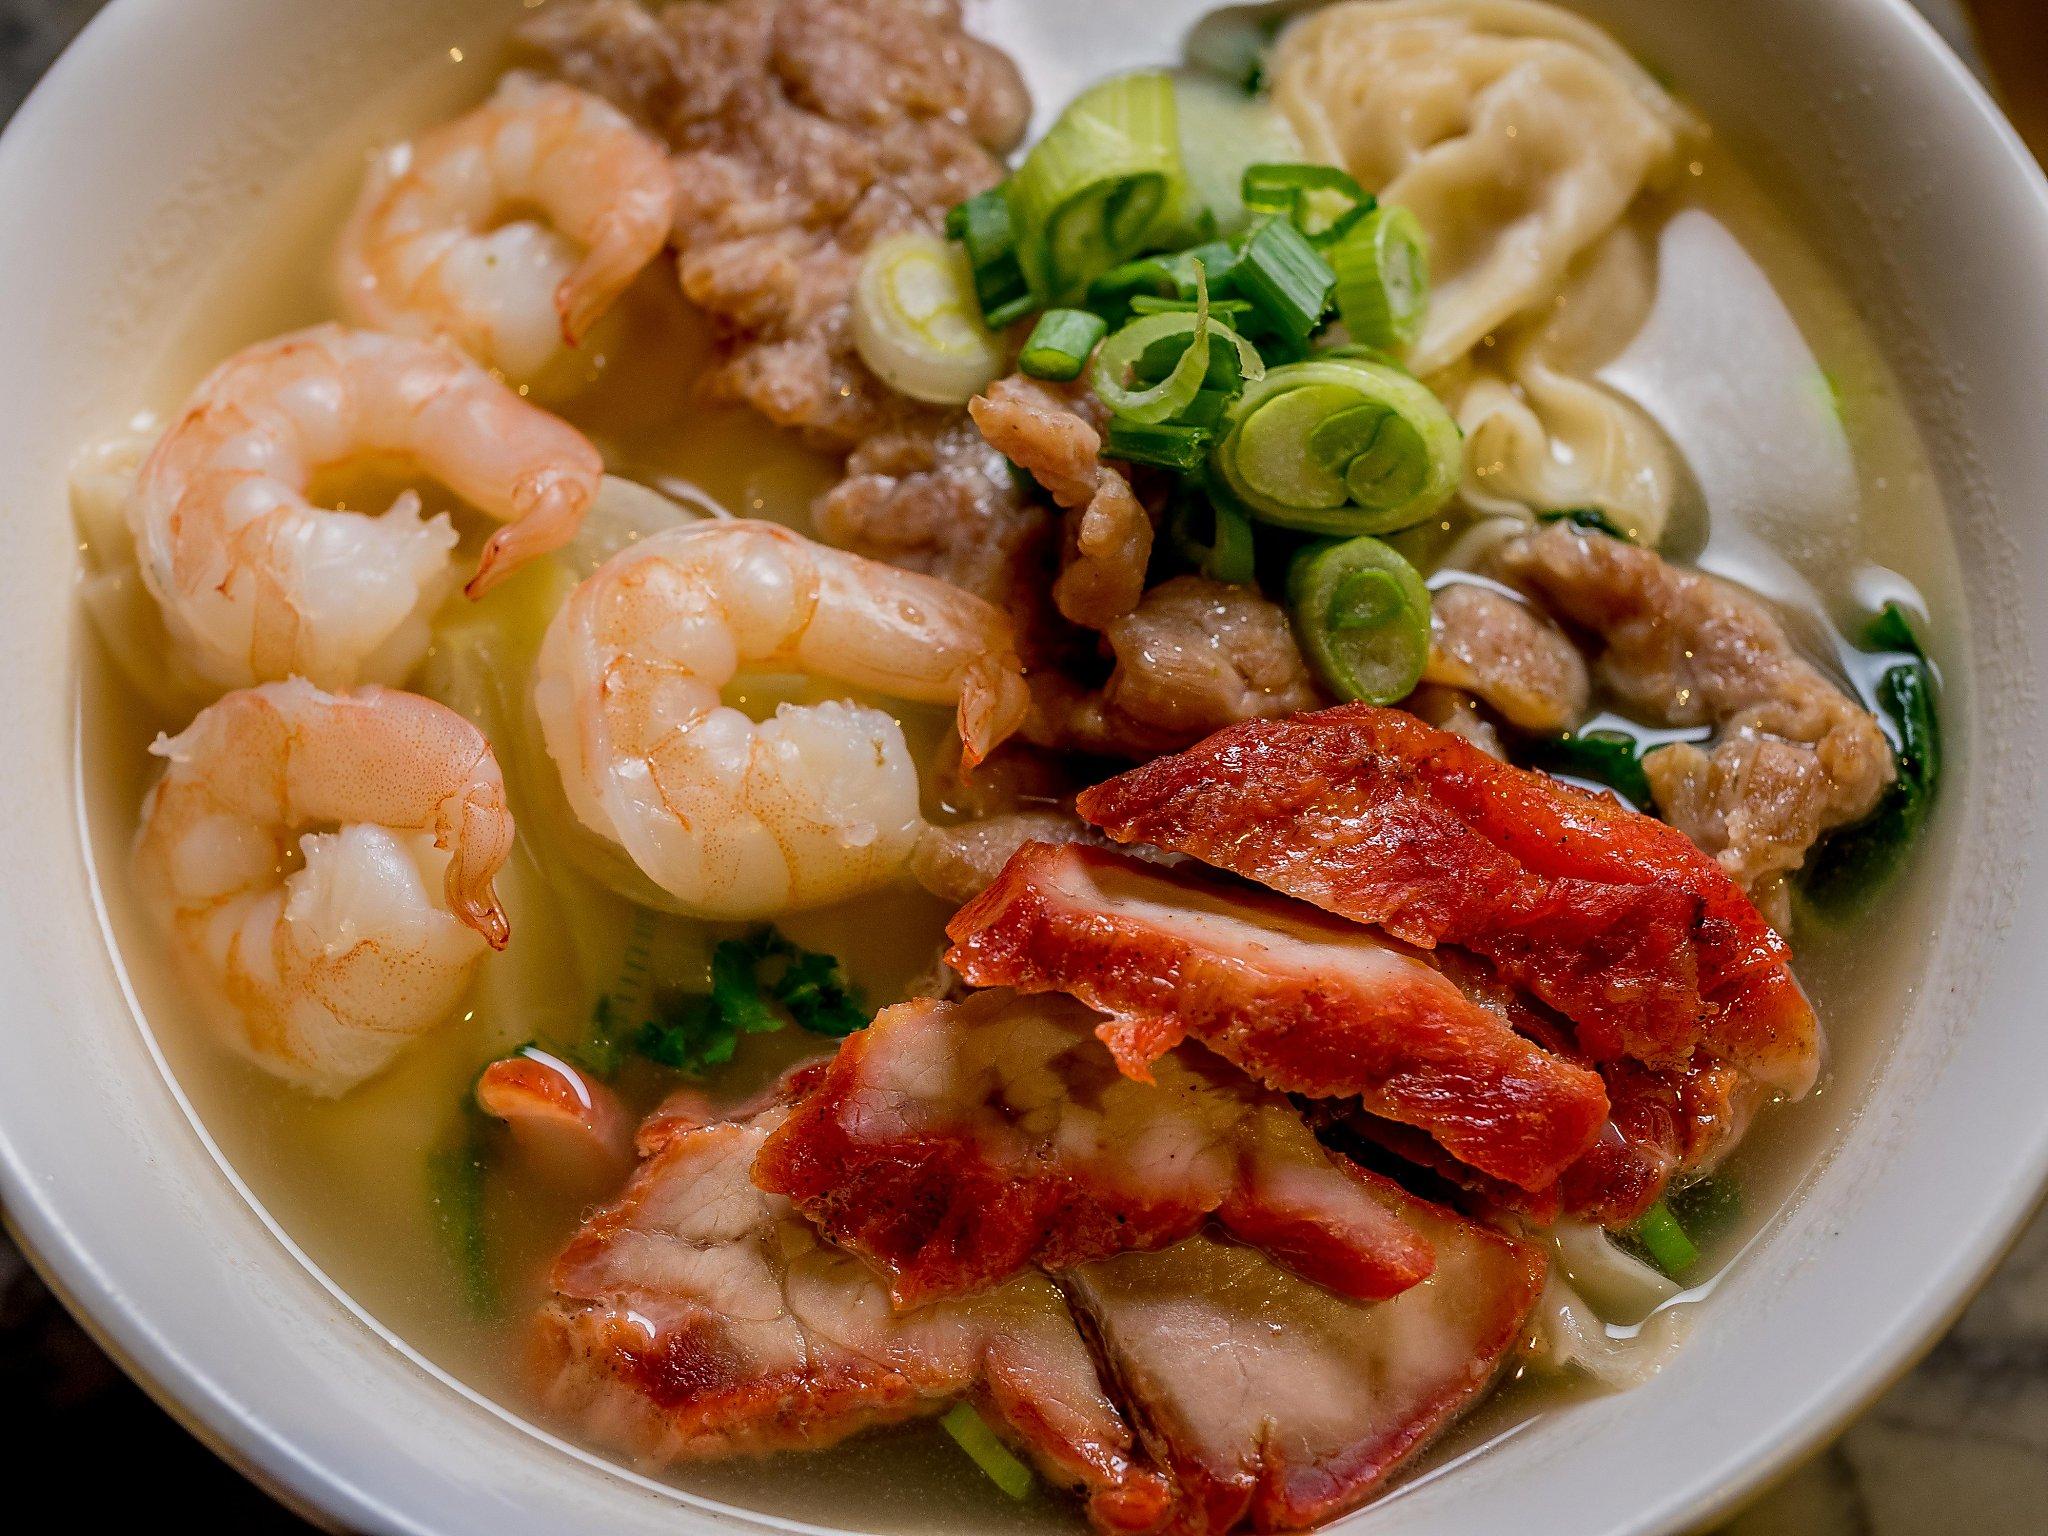 San Francisco Chinatown restaurants still open during coronavirus: Here's the list